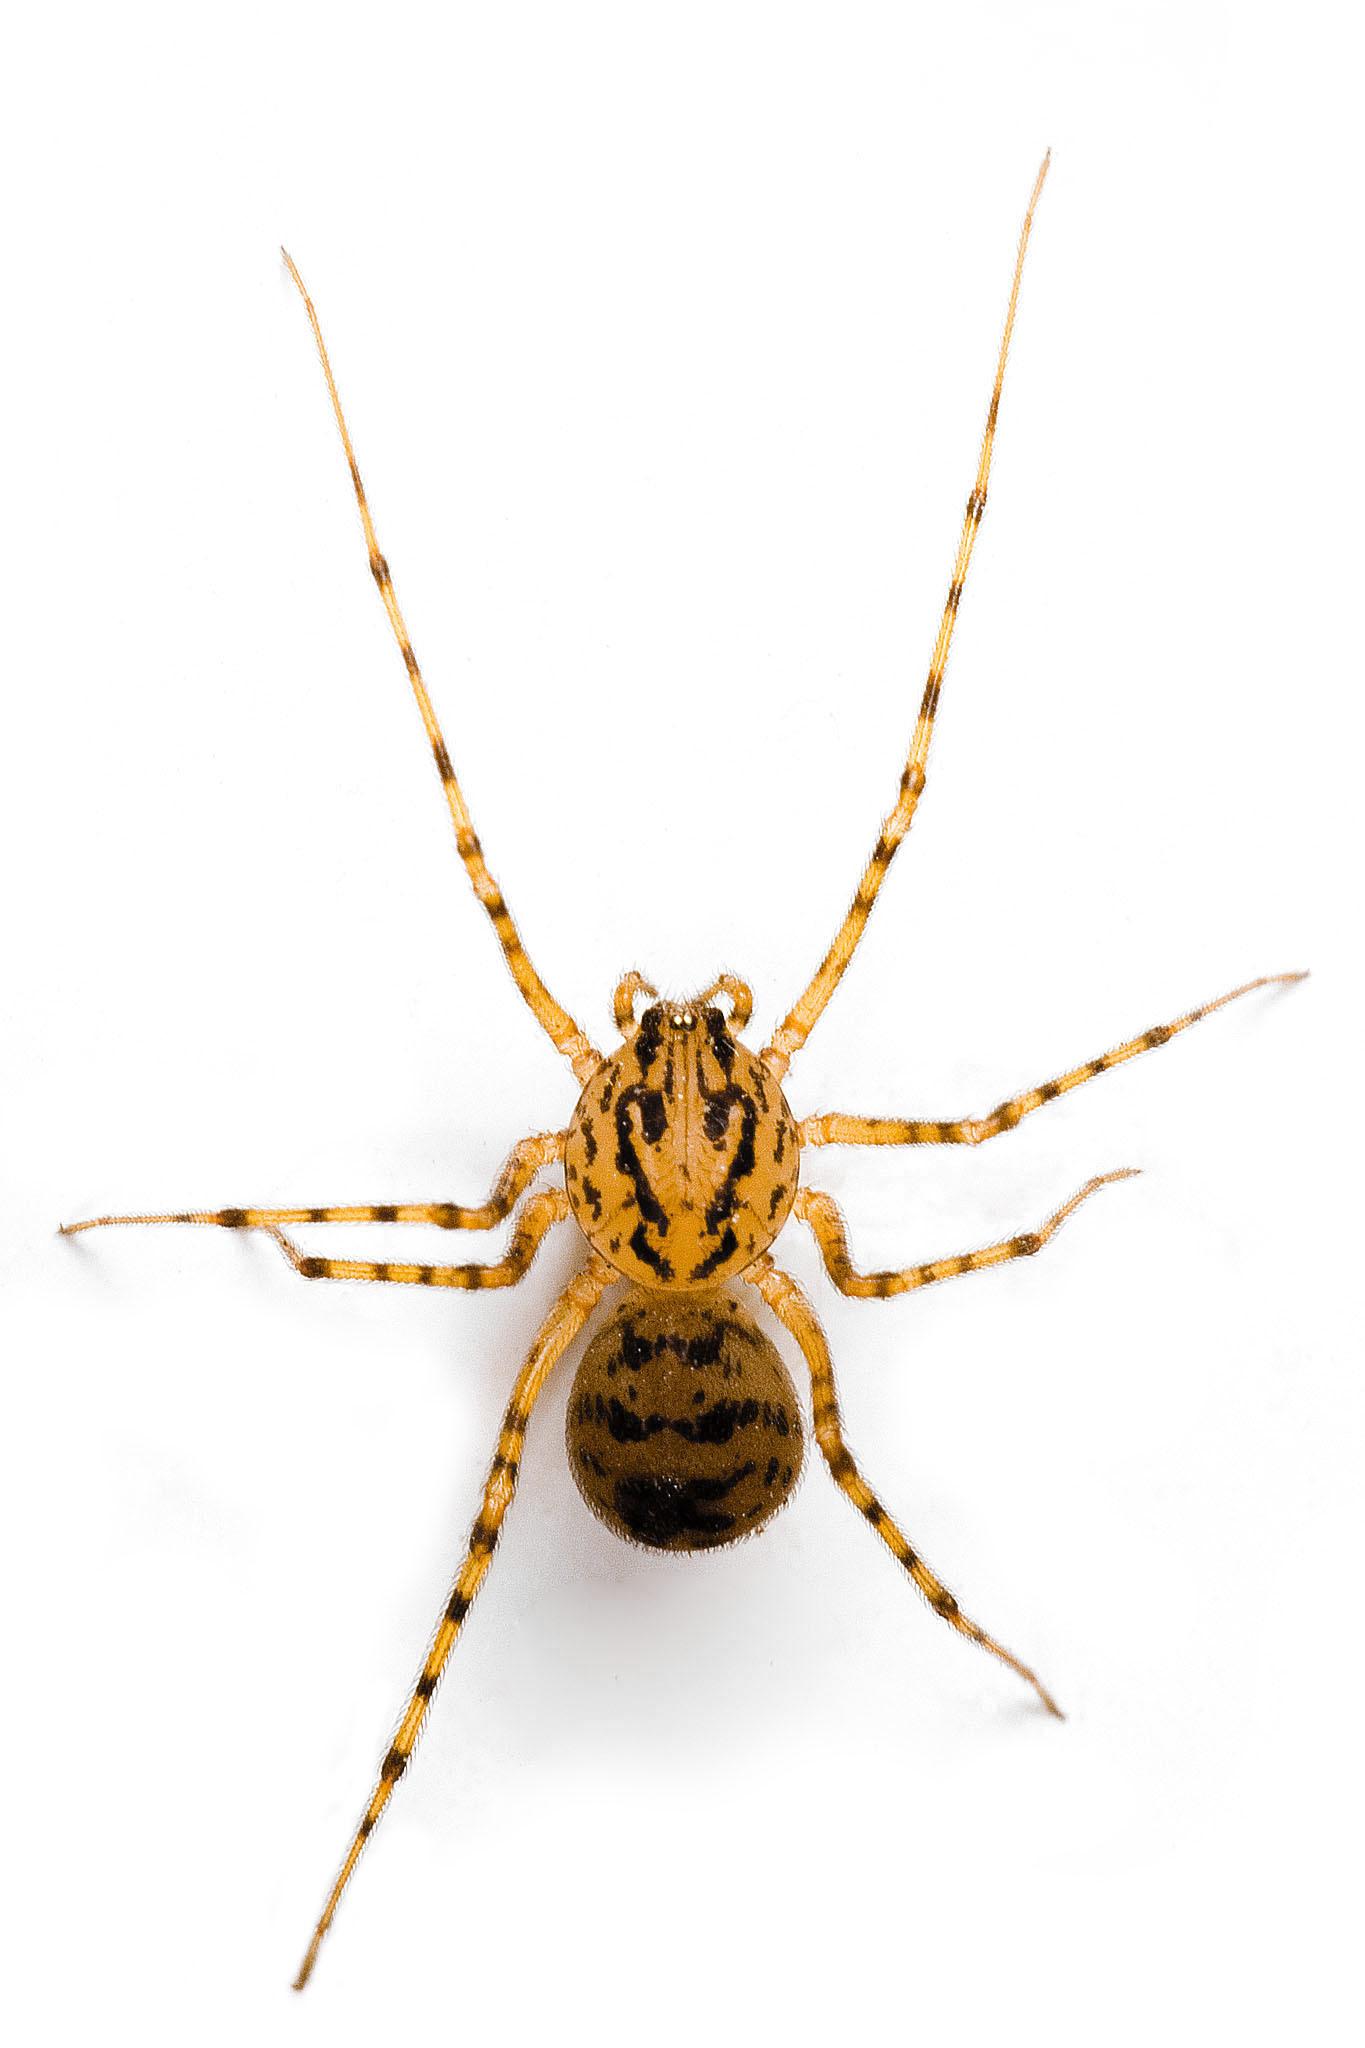 Image of <i>Scytodes thoracica</i> (Latreille 1802)